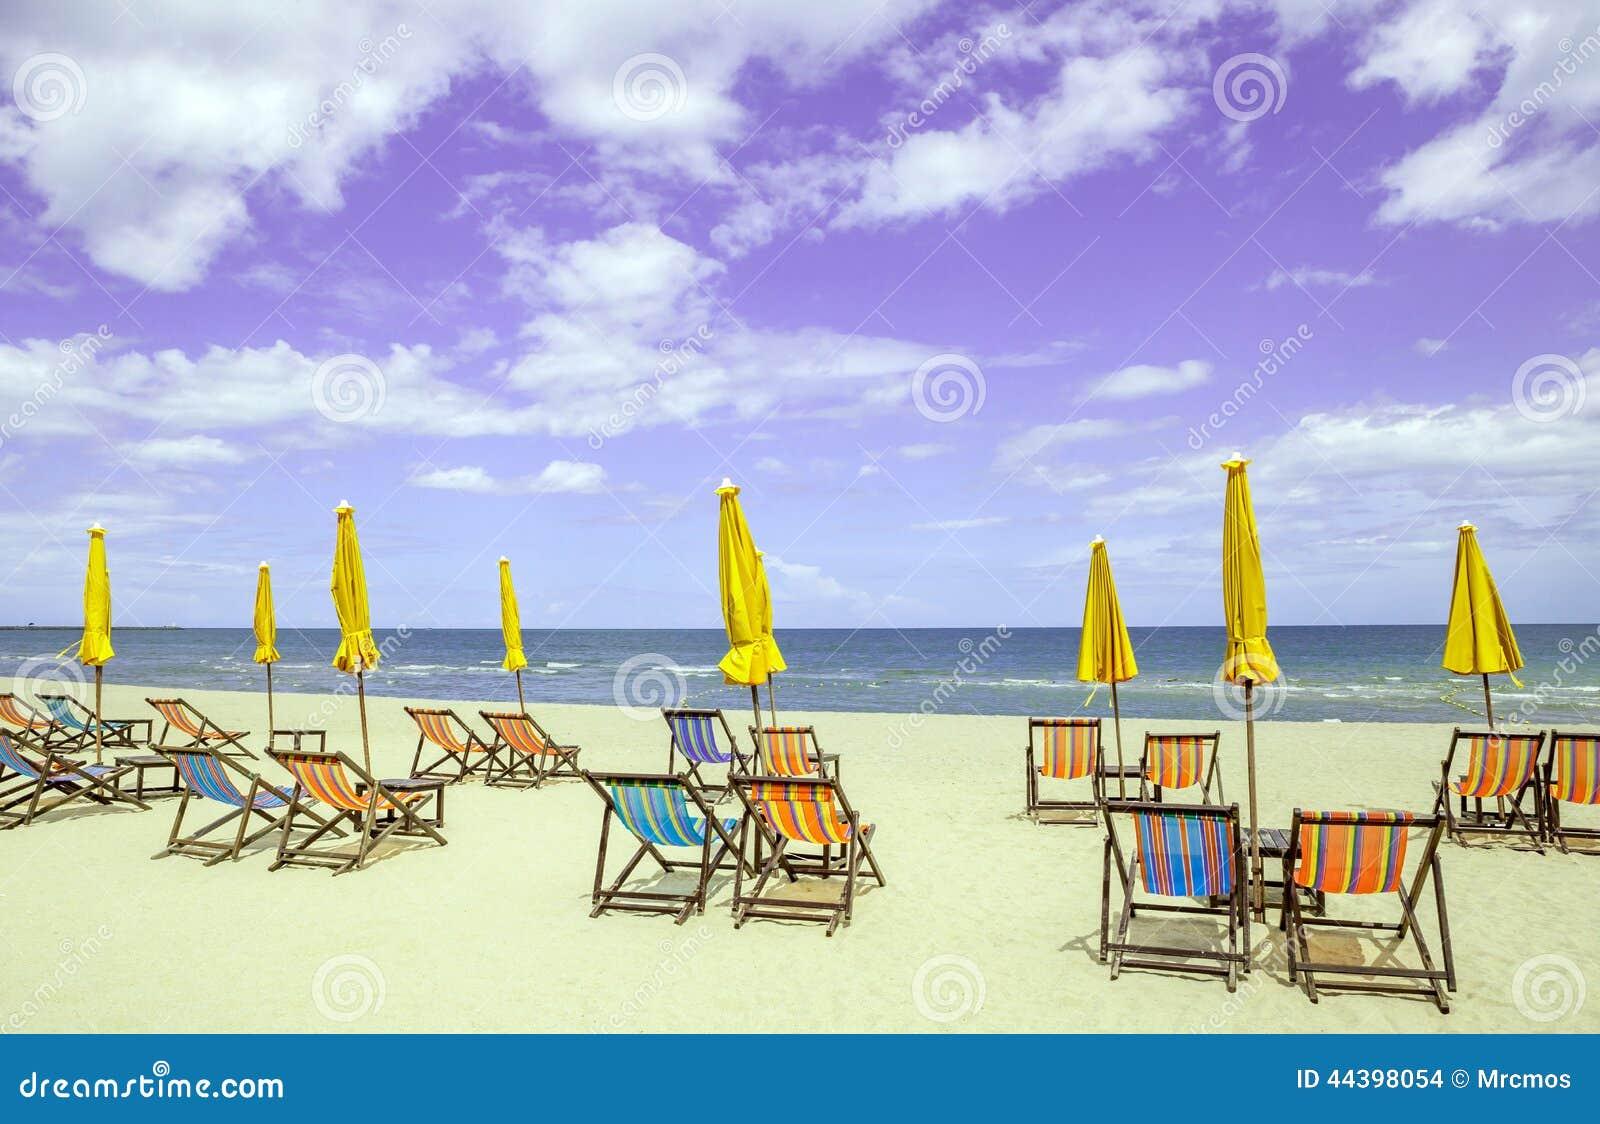 Colorful Beach Chairs - Colorful beach chairs and closed sun umbrellas on beautiful beac